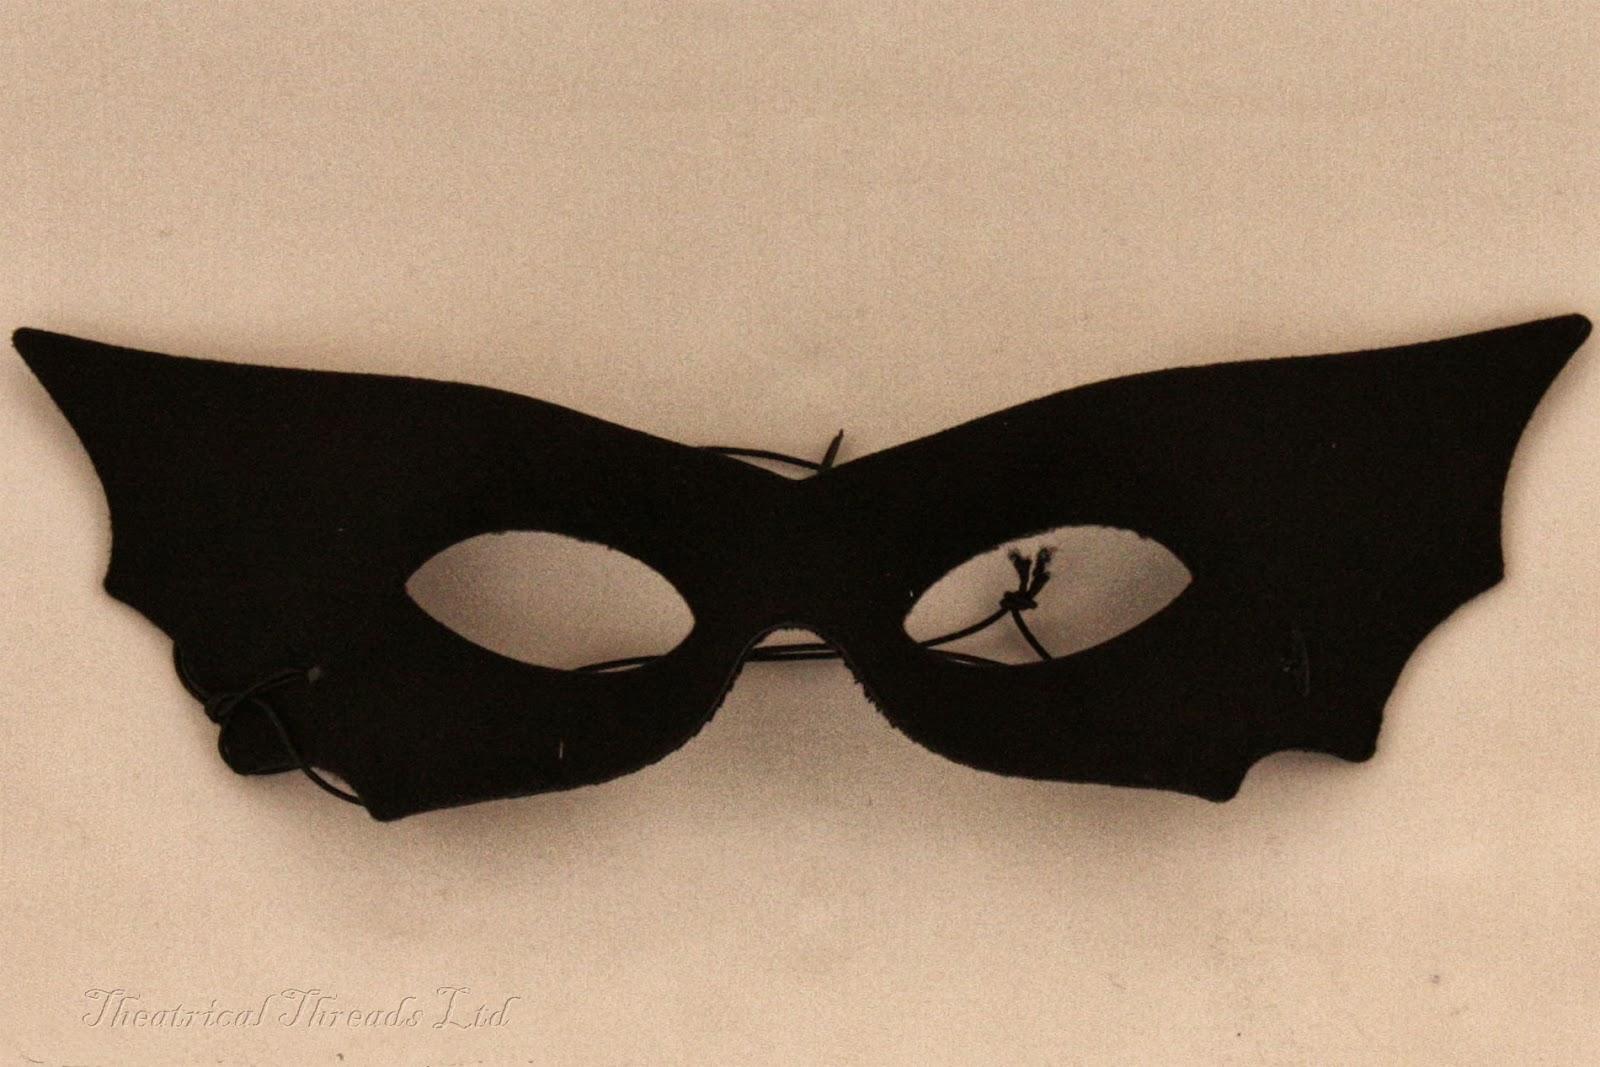 2a51bdb21ead Sexy Black Bat Masquerade Ball Mask from Theatrical Threads Ltd